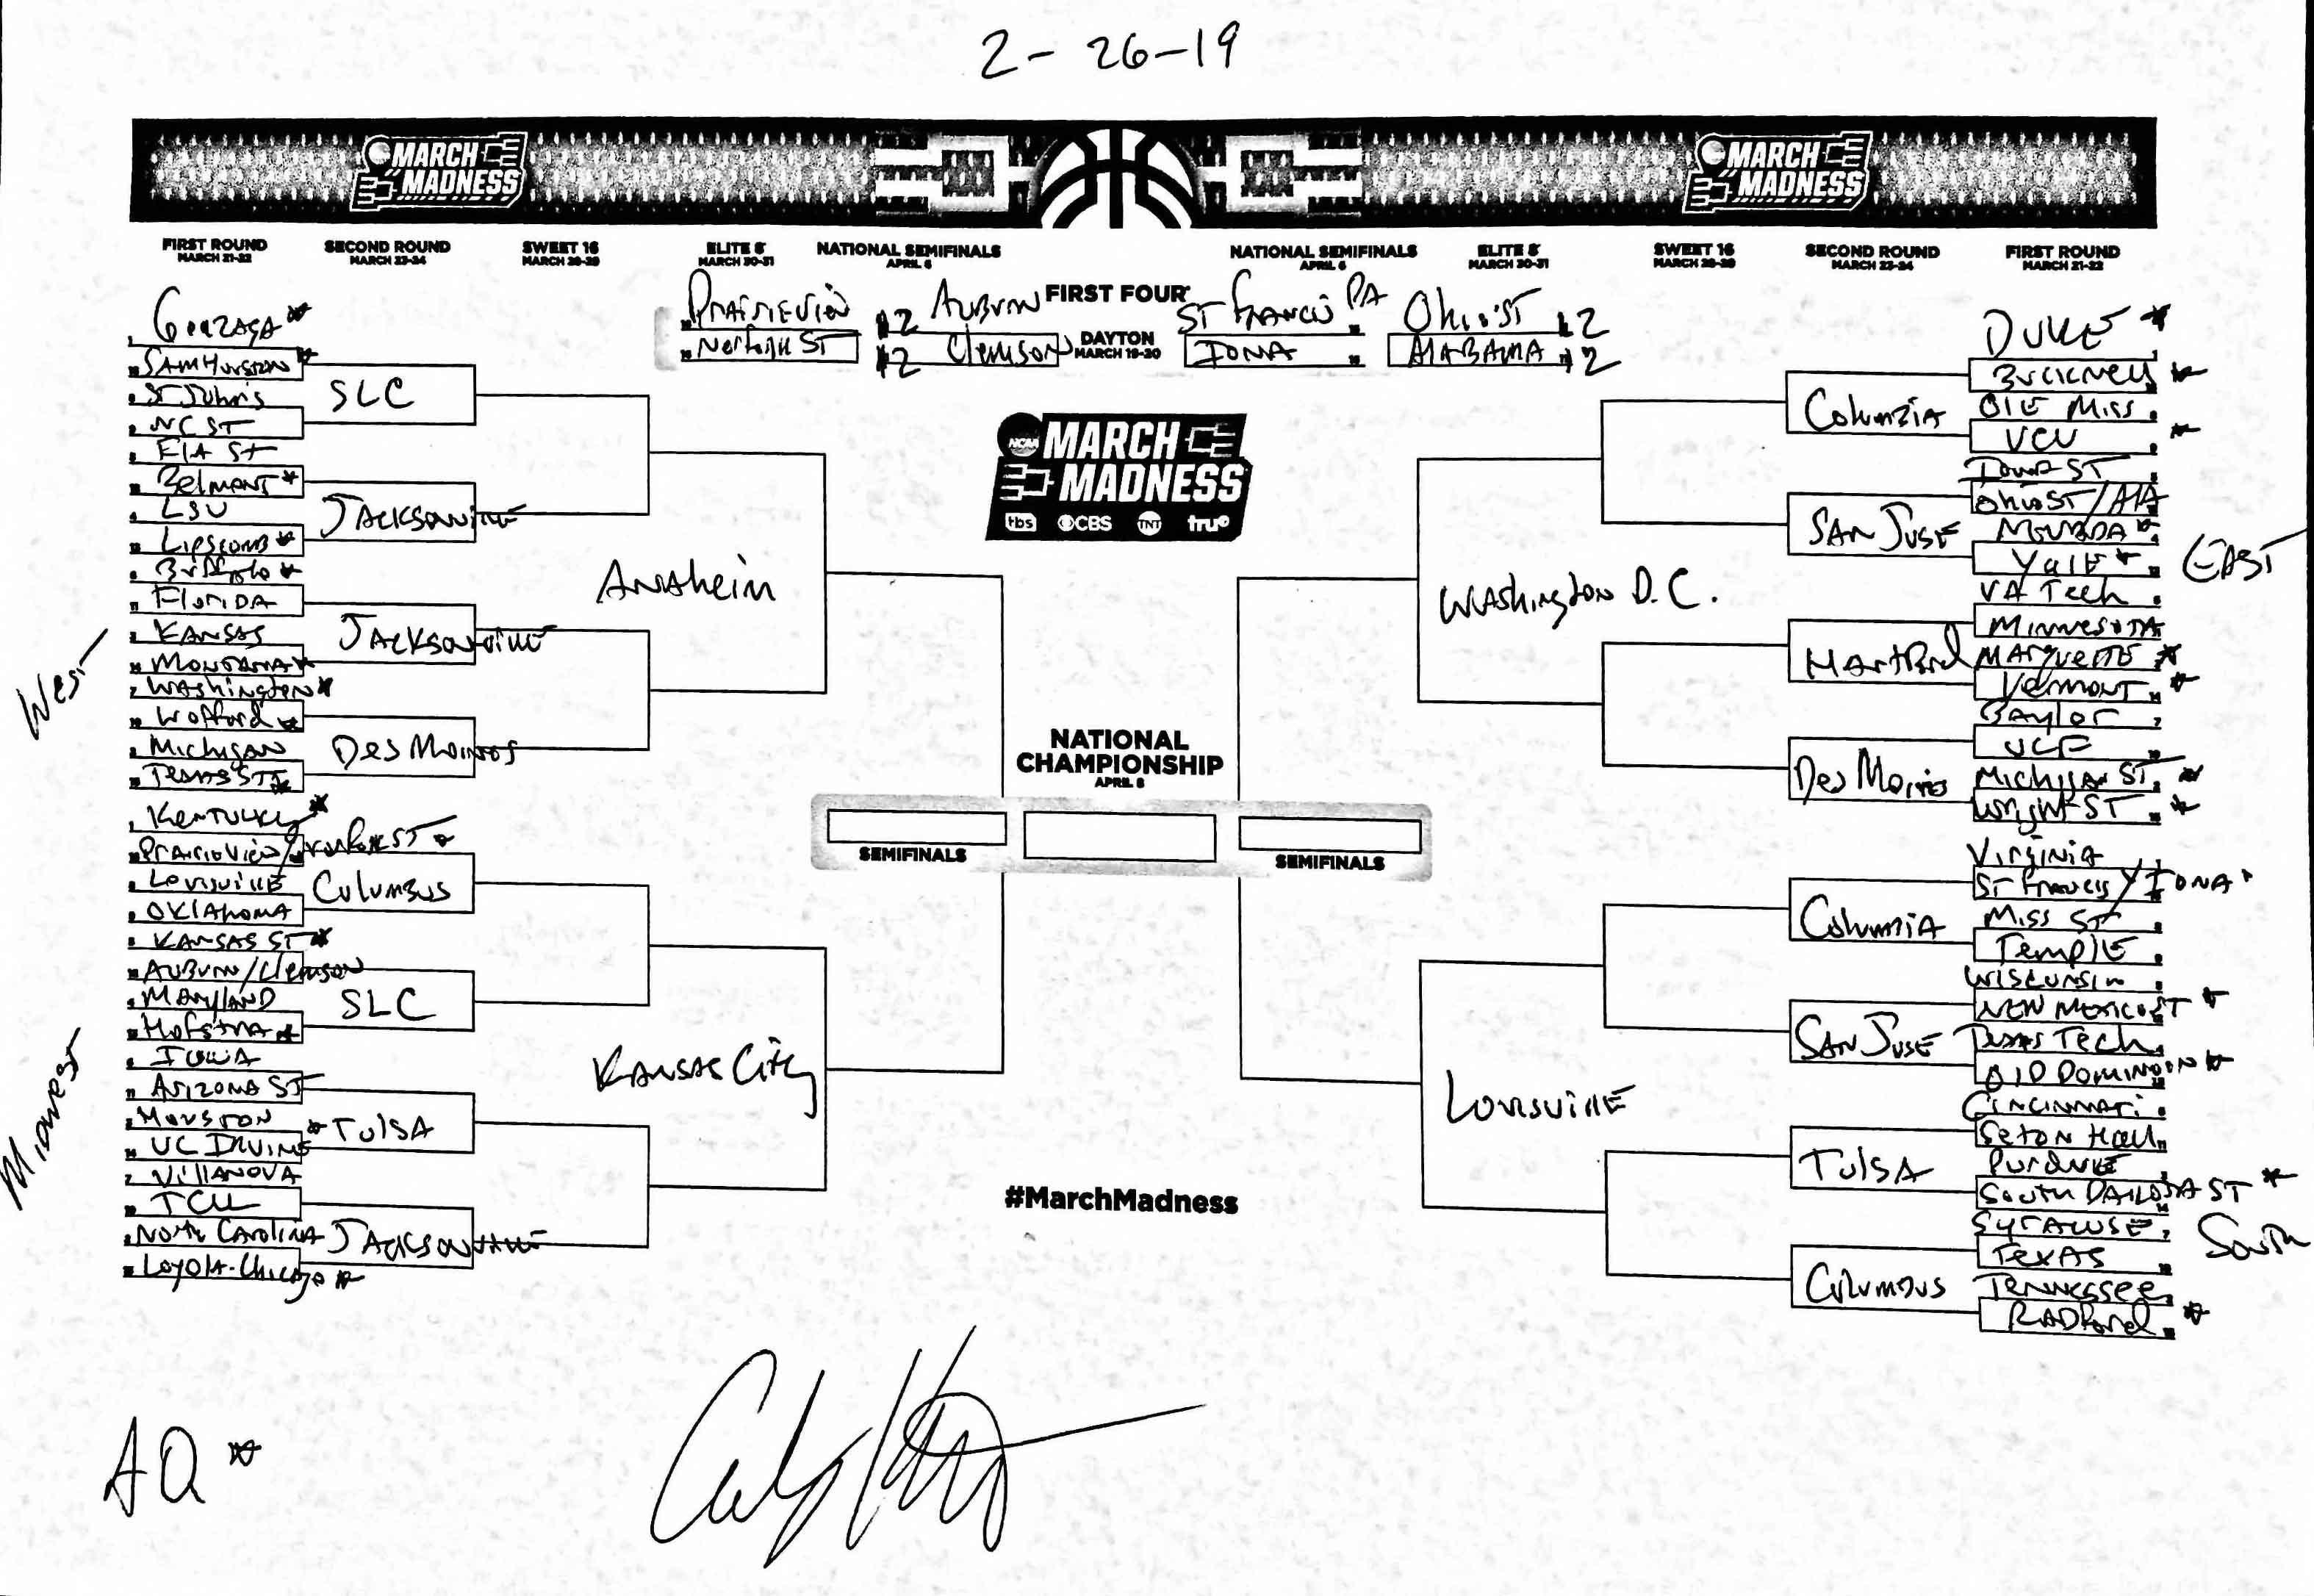 Andy Katz's NCAA tournament bracket prediction February 26